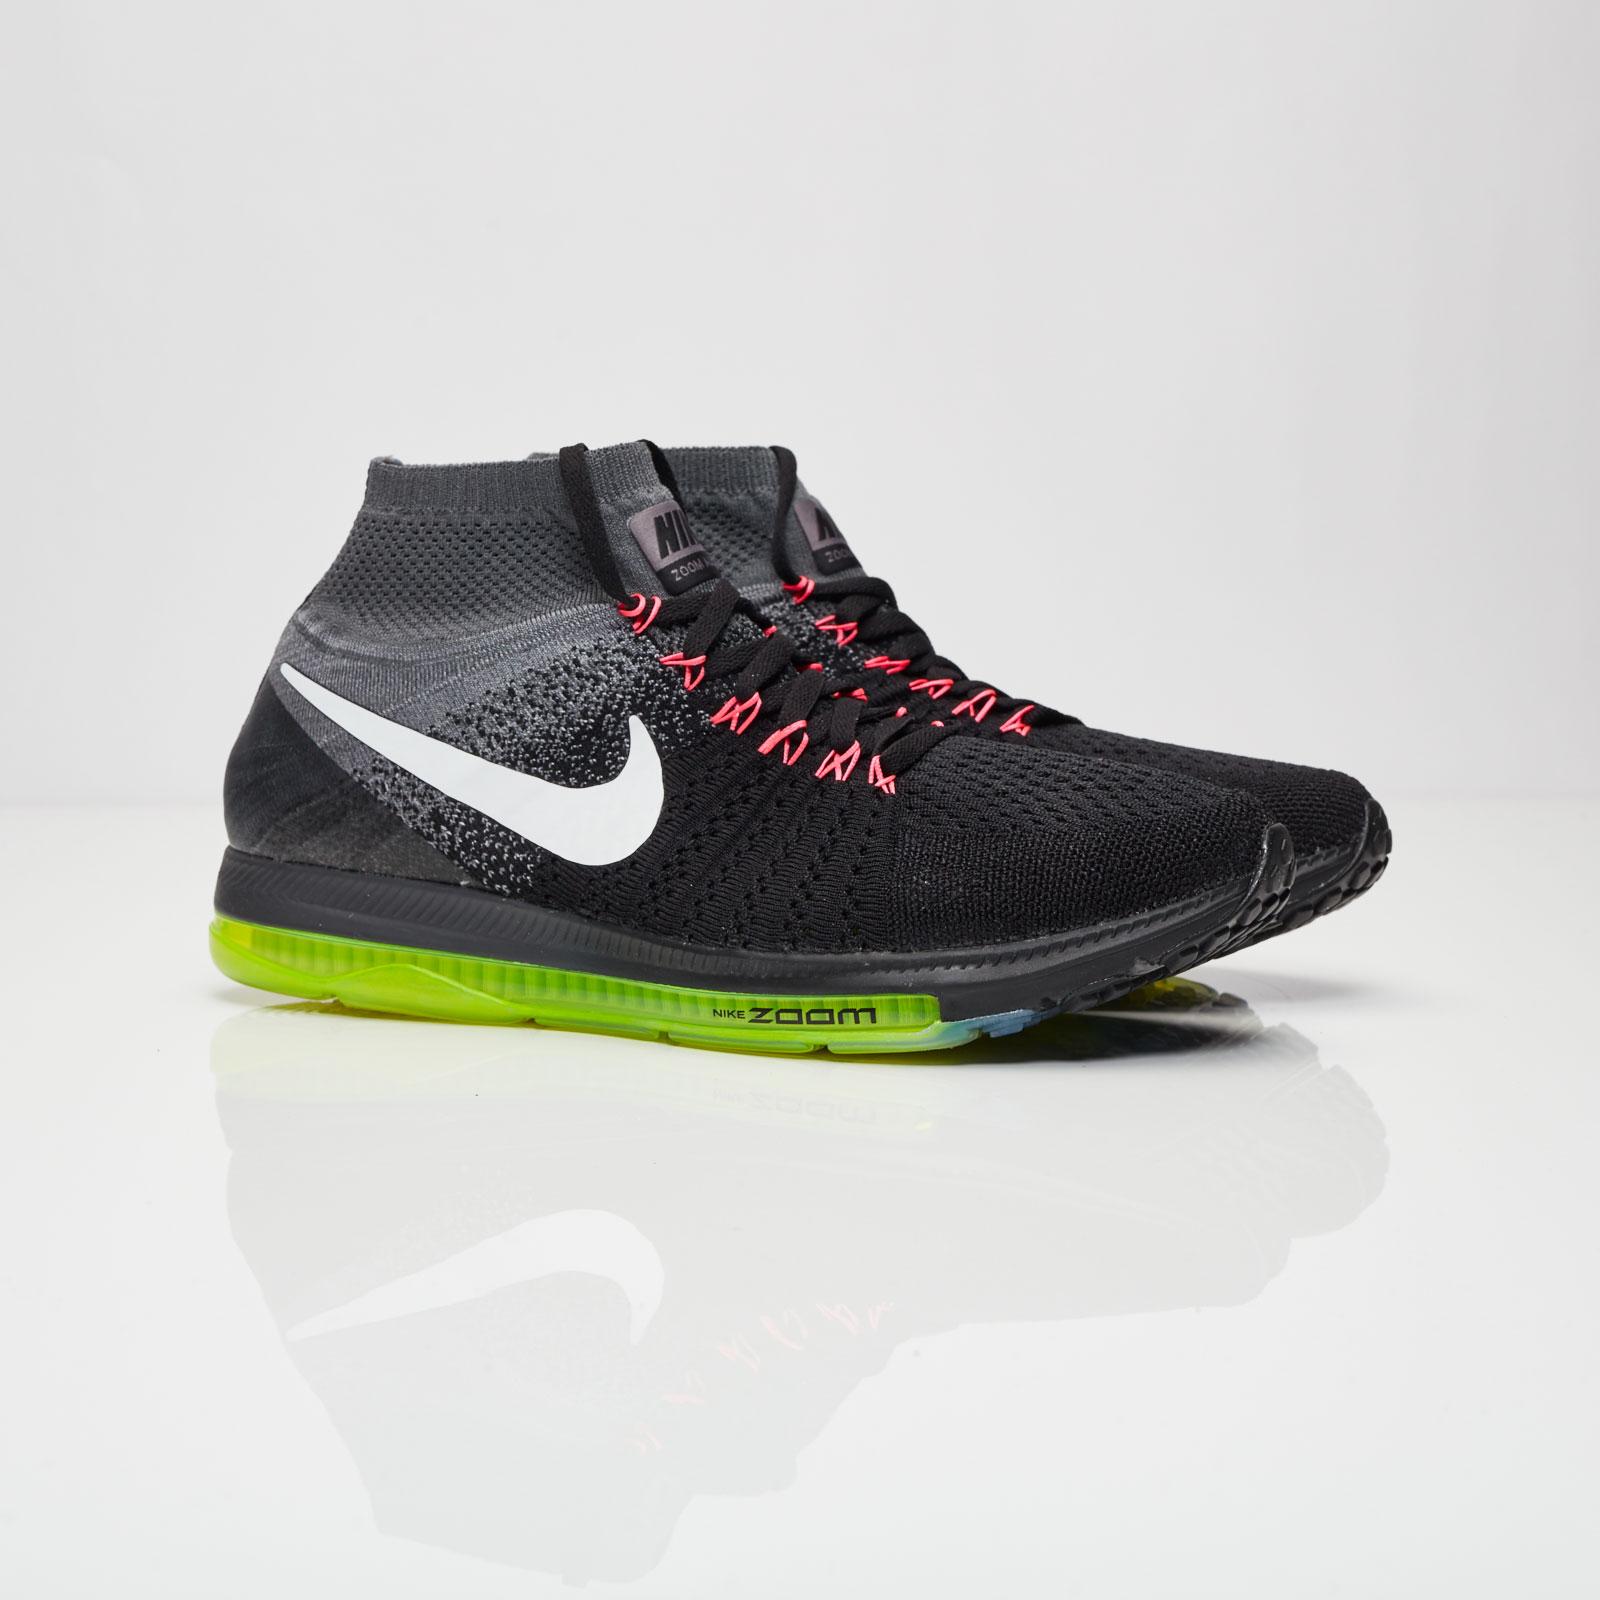 Nike Zoom All Out Flyknit - 844134-002 - Sneakersnstuff  1f5d94655b68